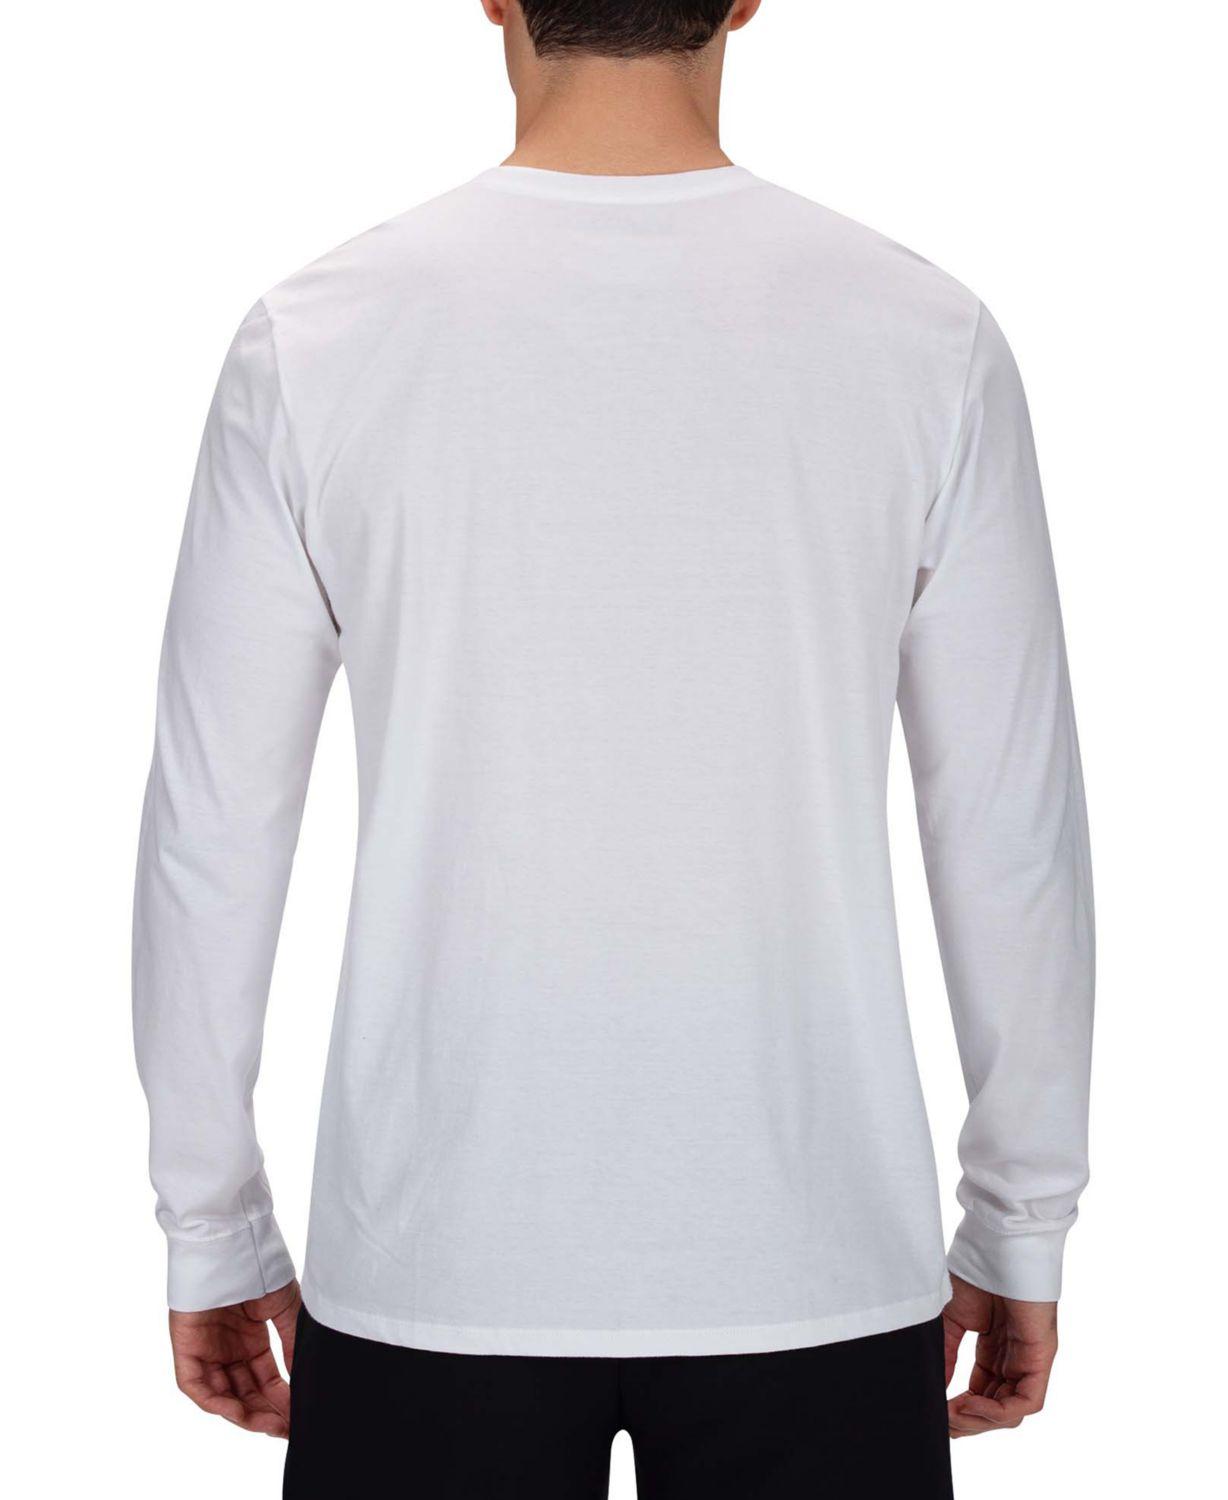 Hurley Men's Lightning Logo Long Sleeve T-Shirt & Reviews - T-Shirts - Men - Macy's